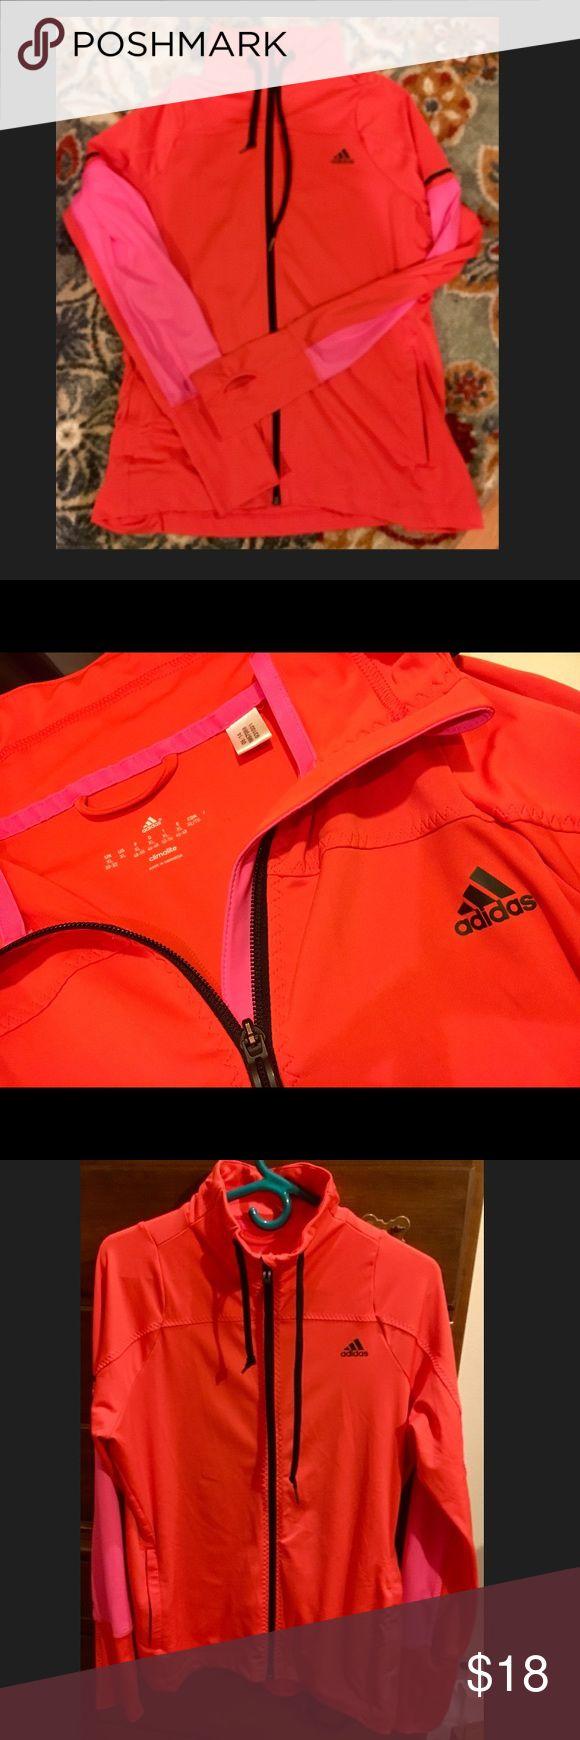 NWOT Woman's Adidas zip up jacket,  size XL NWOT Woman's Adidas zip up jacket,  size XL. So cute! Great orange and hot pink combo and thumb holes! Adidas Tops Sweatshirts & Hoodies